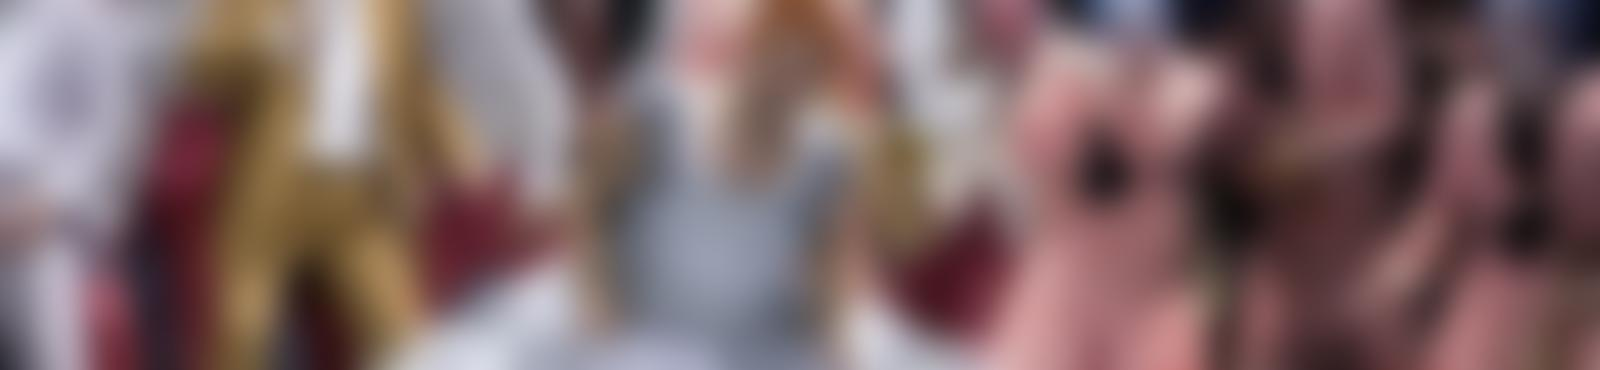 Blurred 054524d1 2891 4034 9db8 42908ff8ab6c